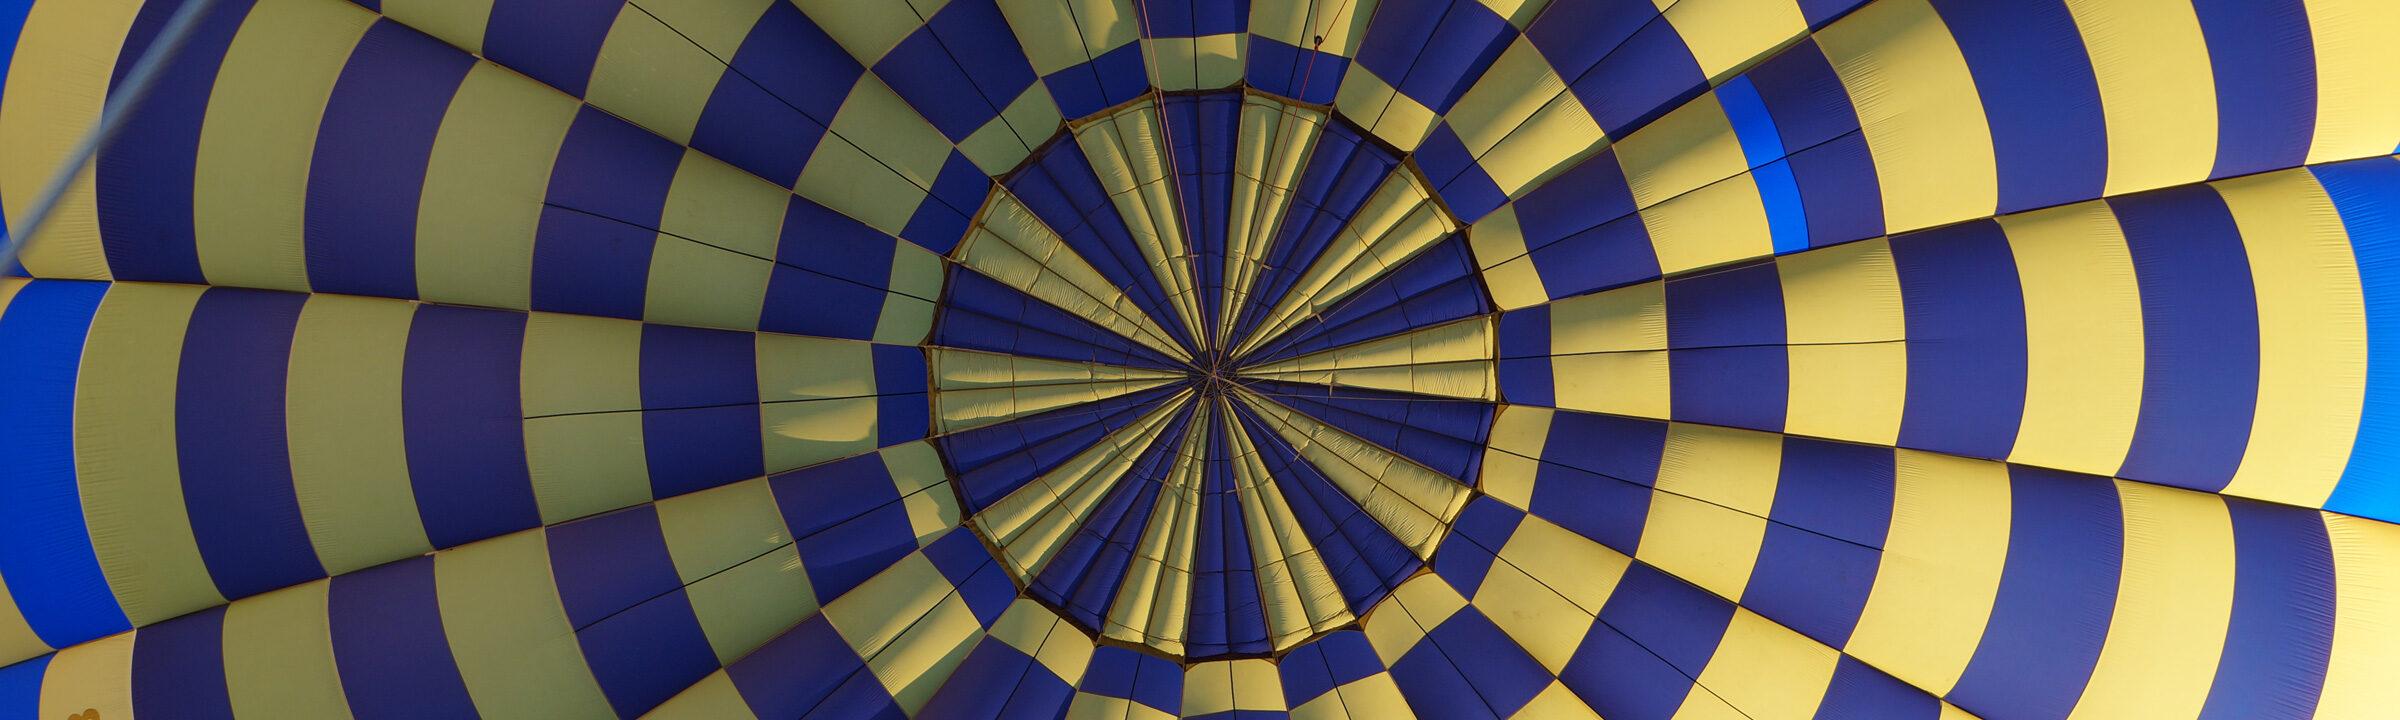 Barlo Ballonvaarten